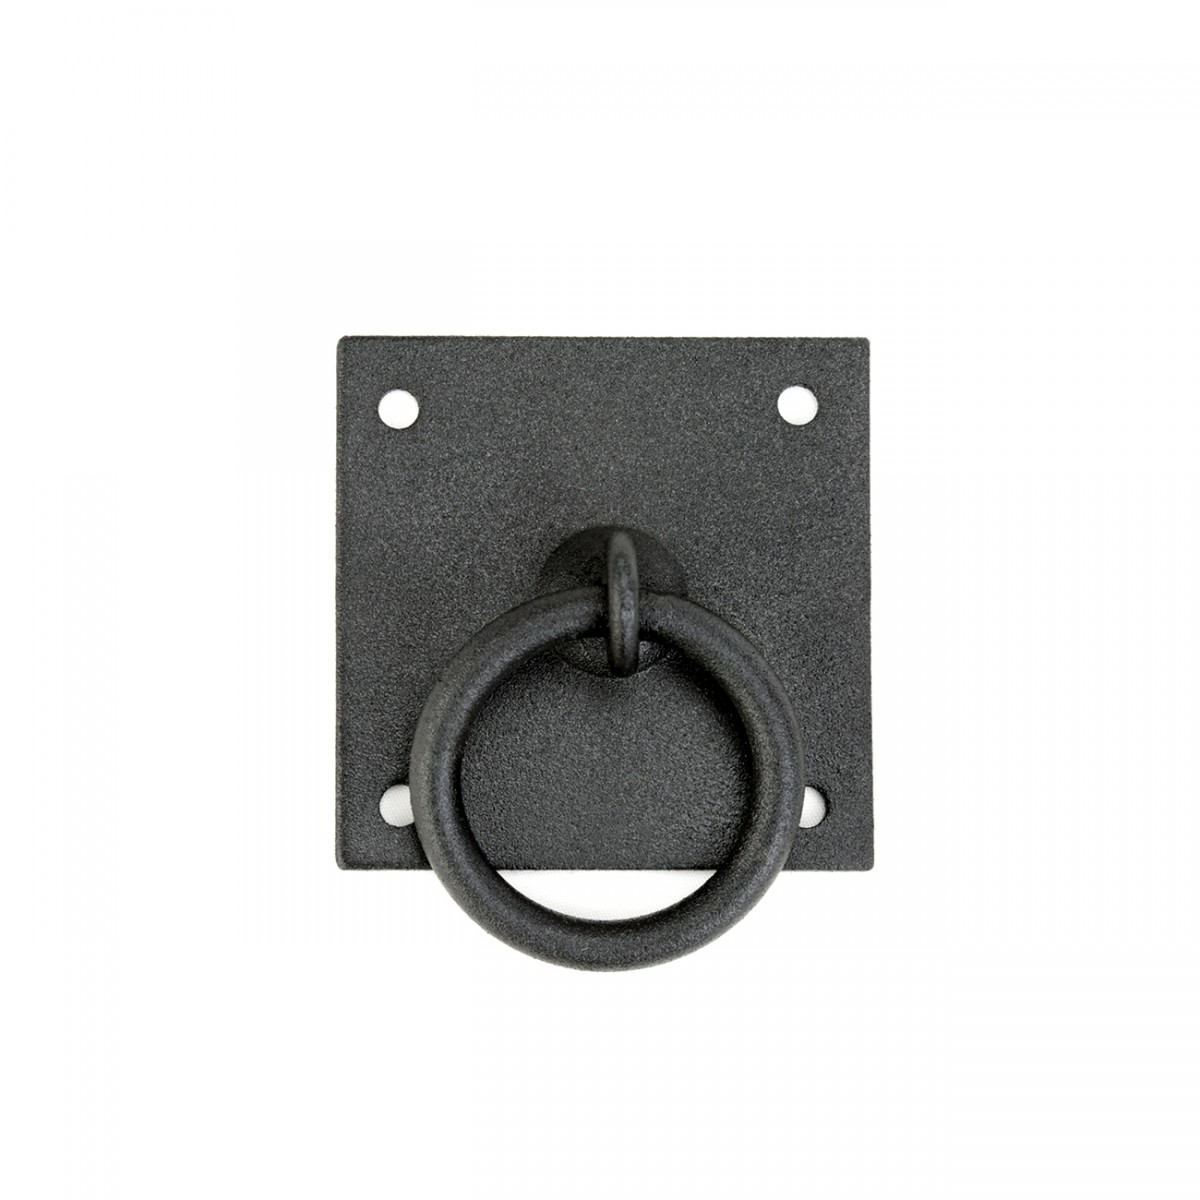 Merveilleux ... U003cPREu003eIron Cabinet Pulls Black RSF Coating Cabinet Ring Pulls 1 3/4 ...